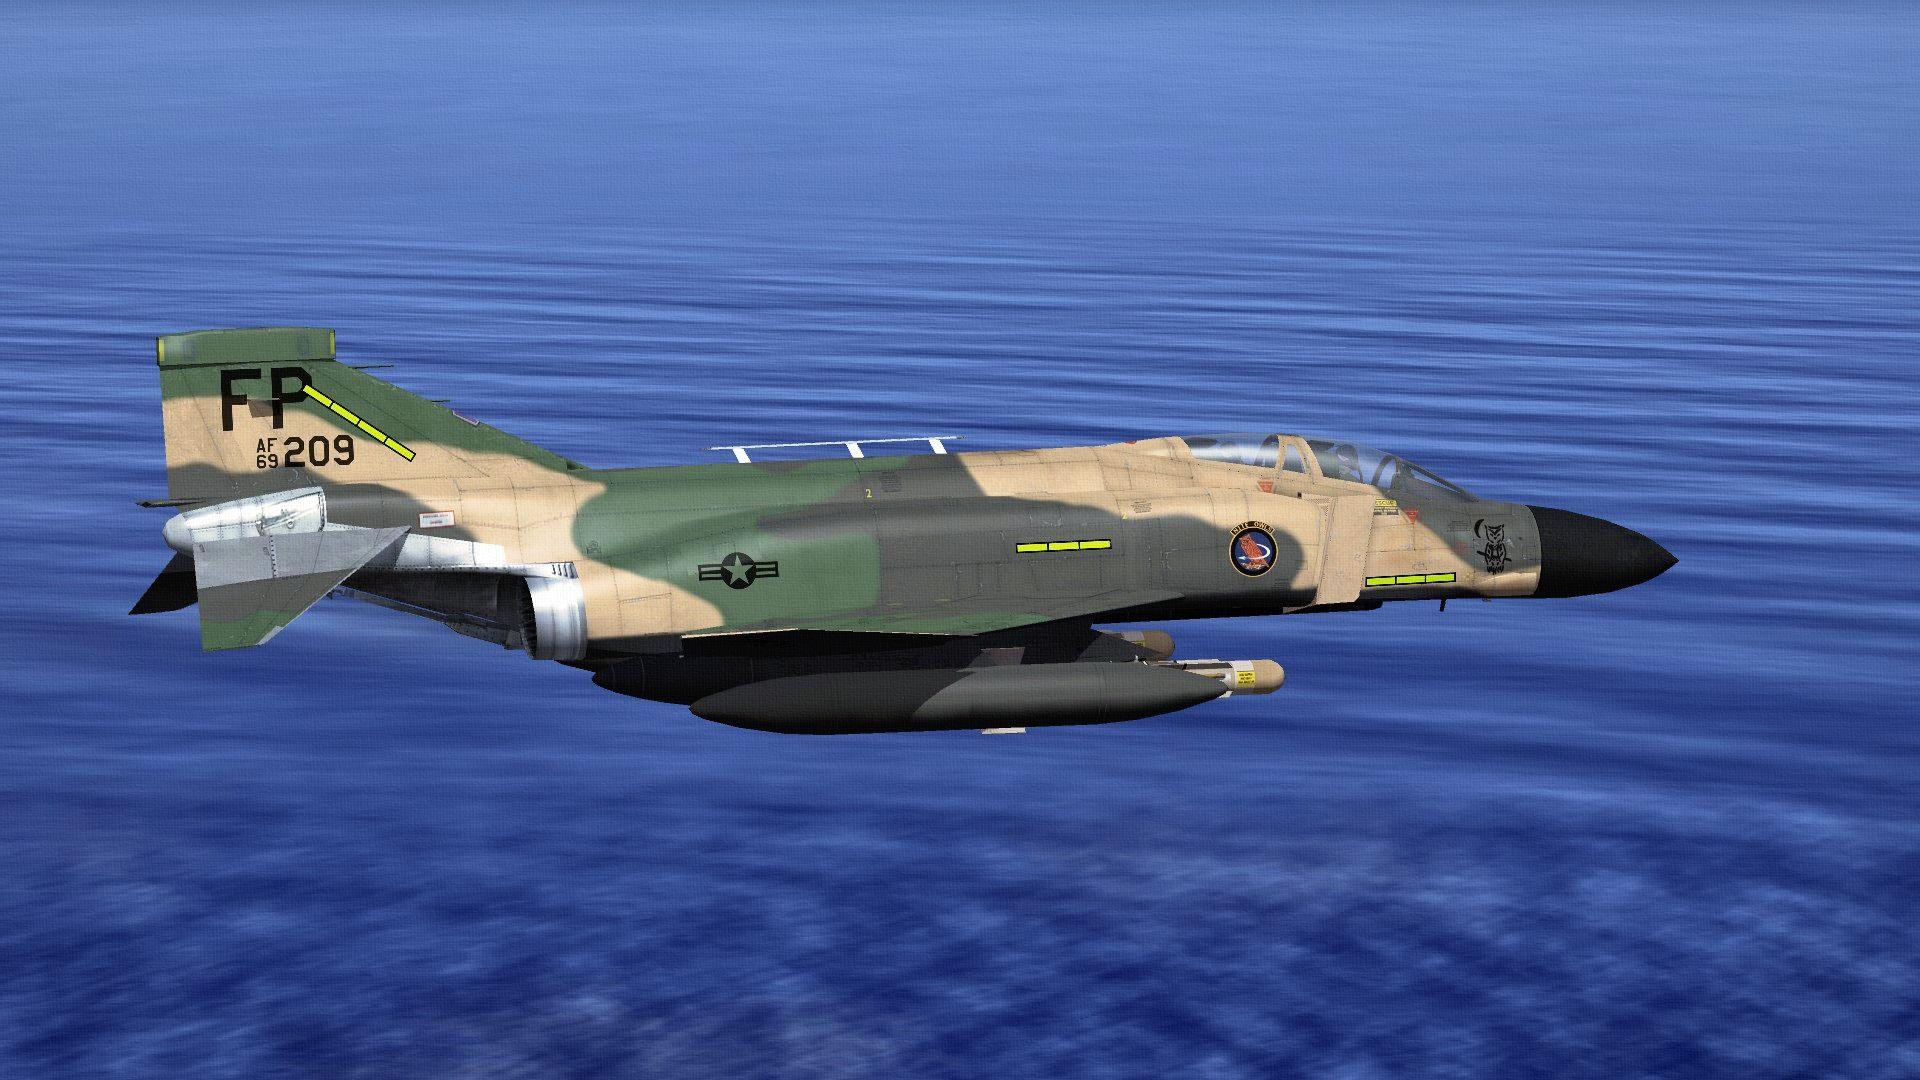 USAFF-4MPHANTOM22_zps8b44219b.jpg